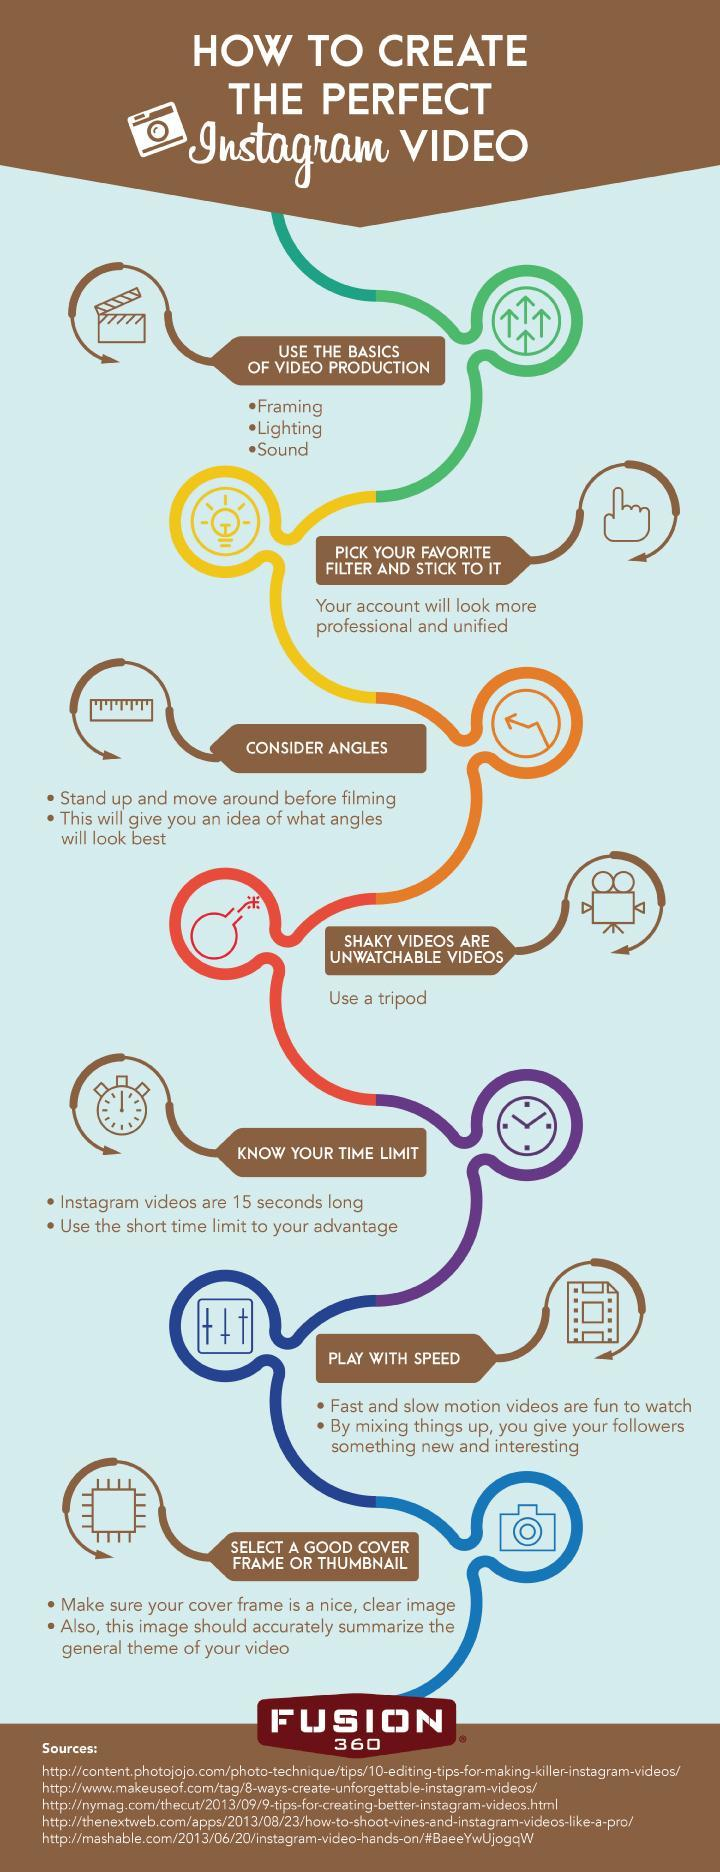 How to Create the Perfect Instagram Video #SocialMedia #Busi... via Lucas Miller